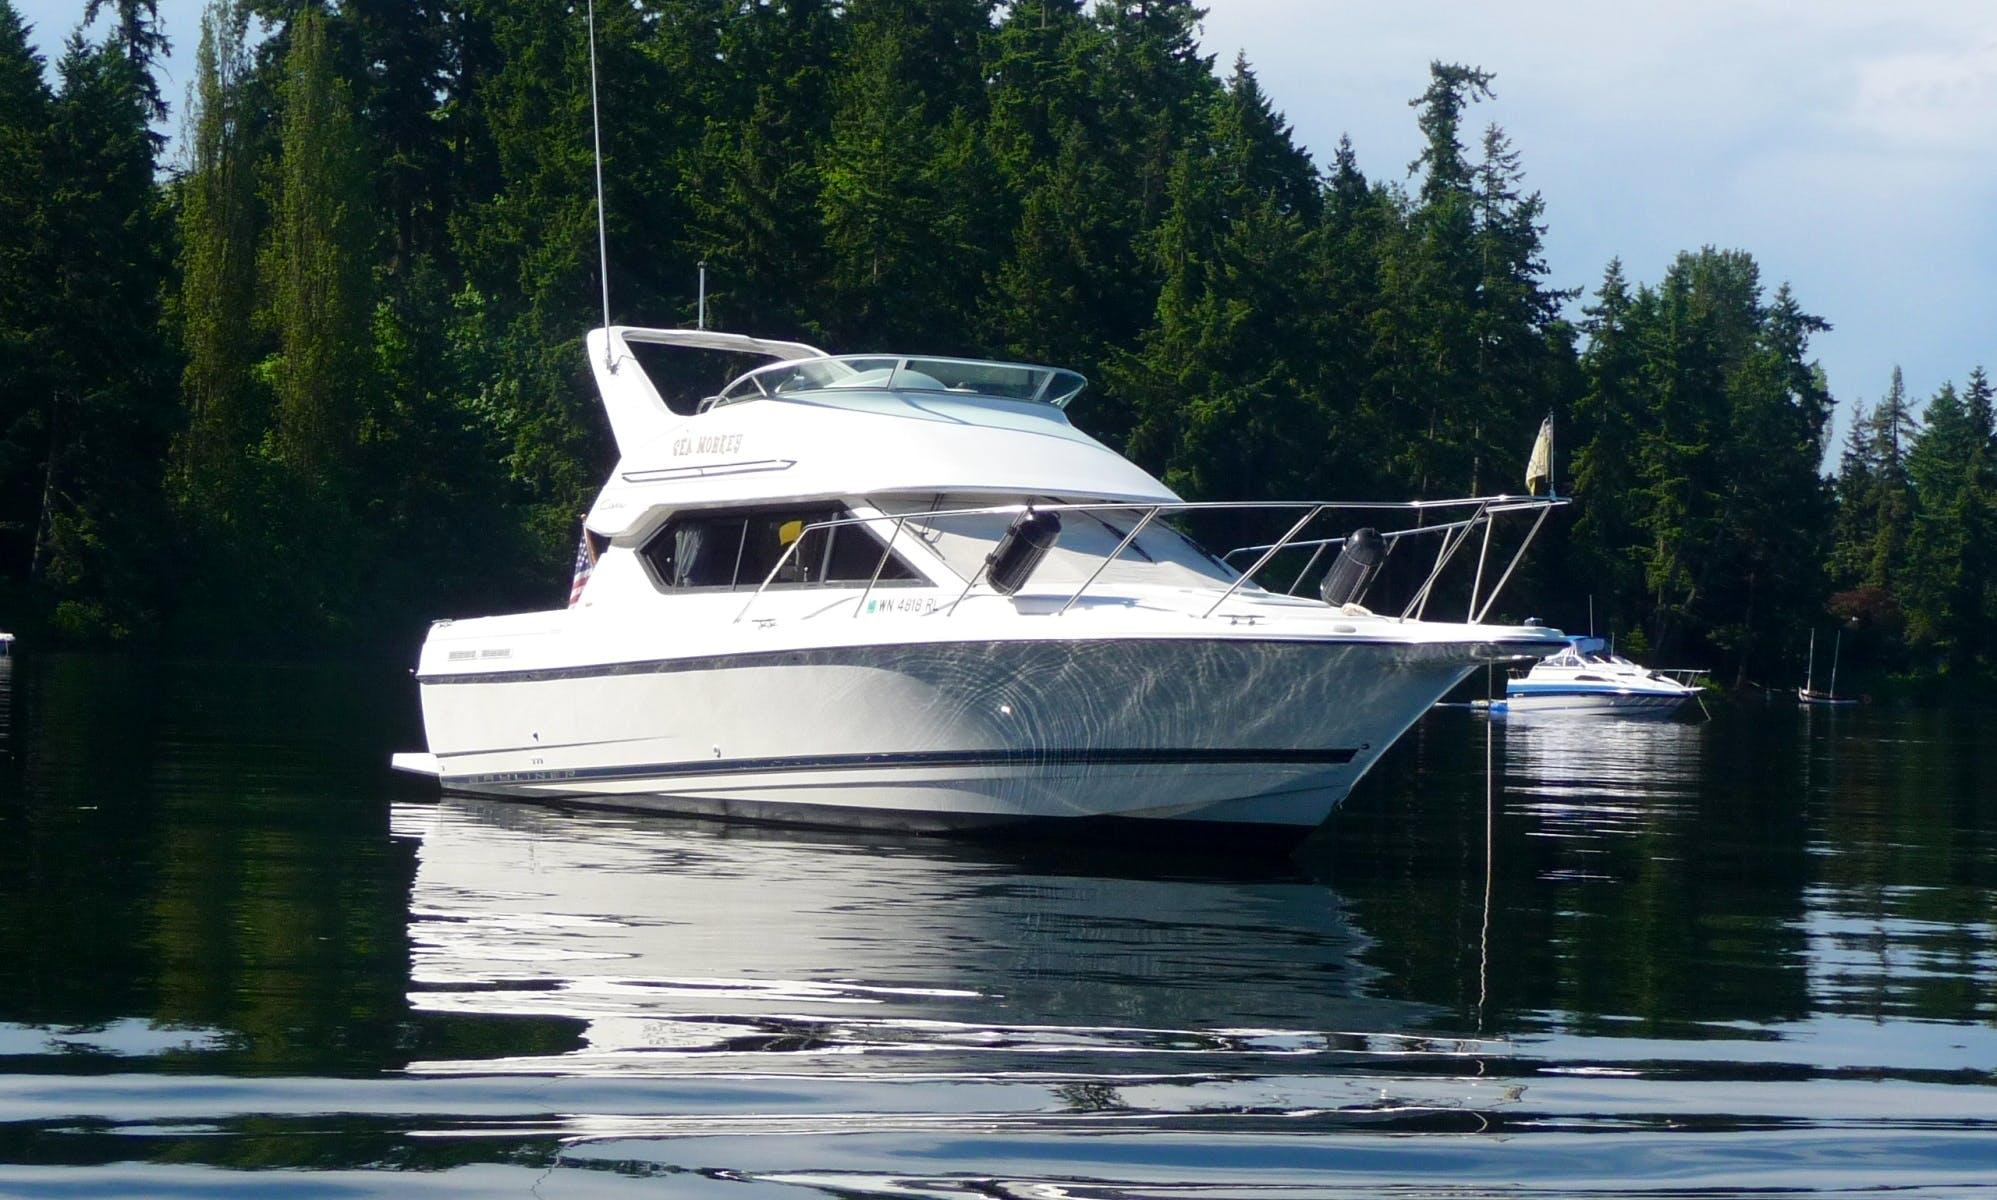 28ft Motor Yacht Rental In Seattle, Washington